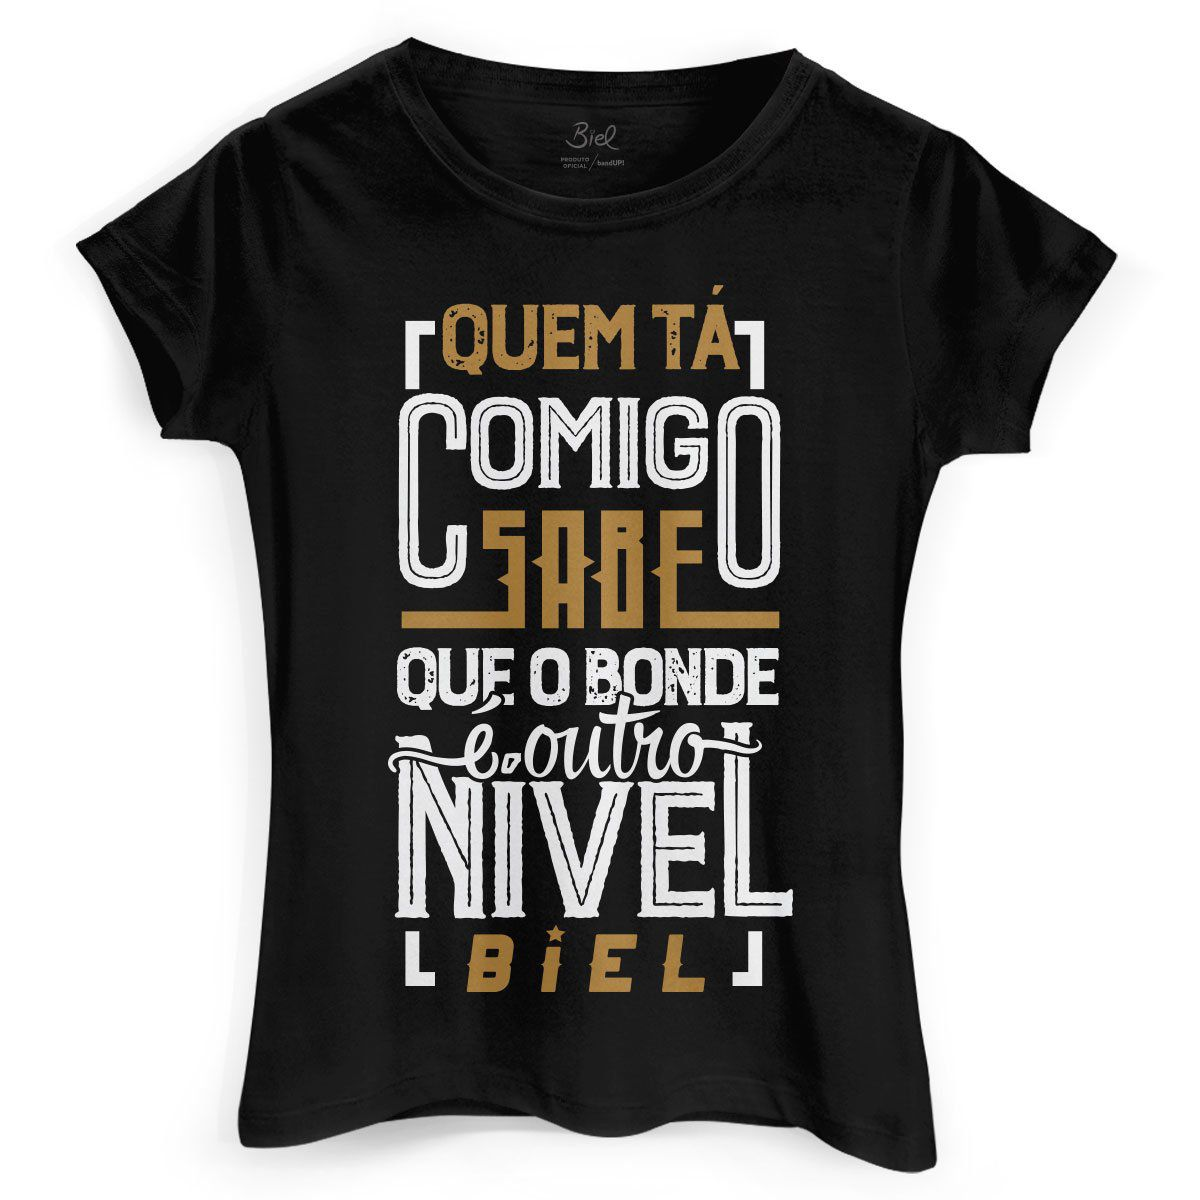 Camiseta Feminina Biel Tô Tirando Onda  - bandUP Store Marketplace